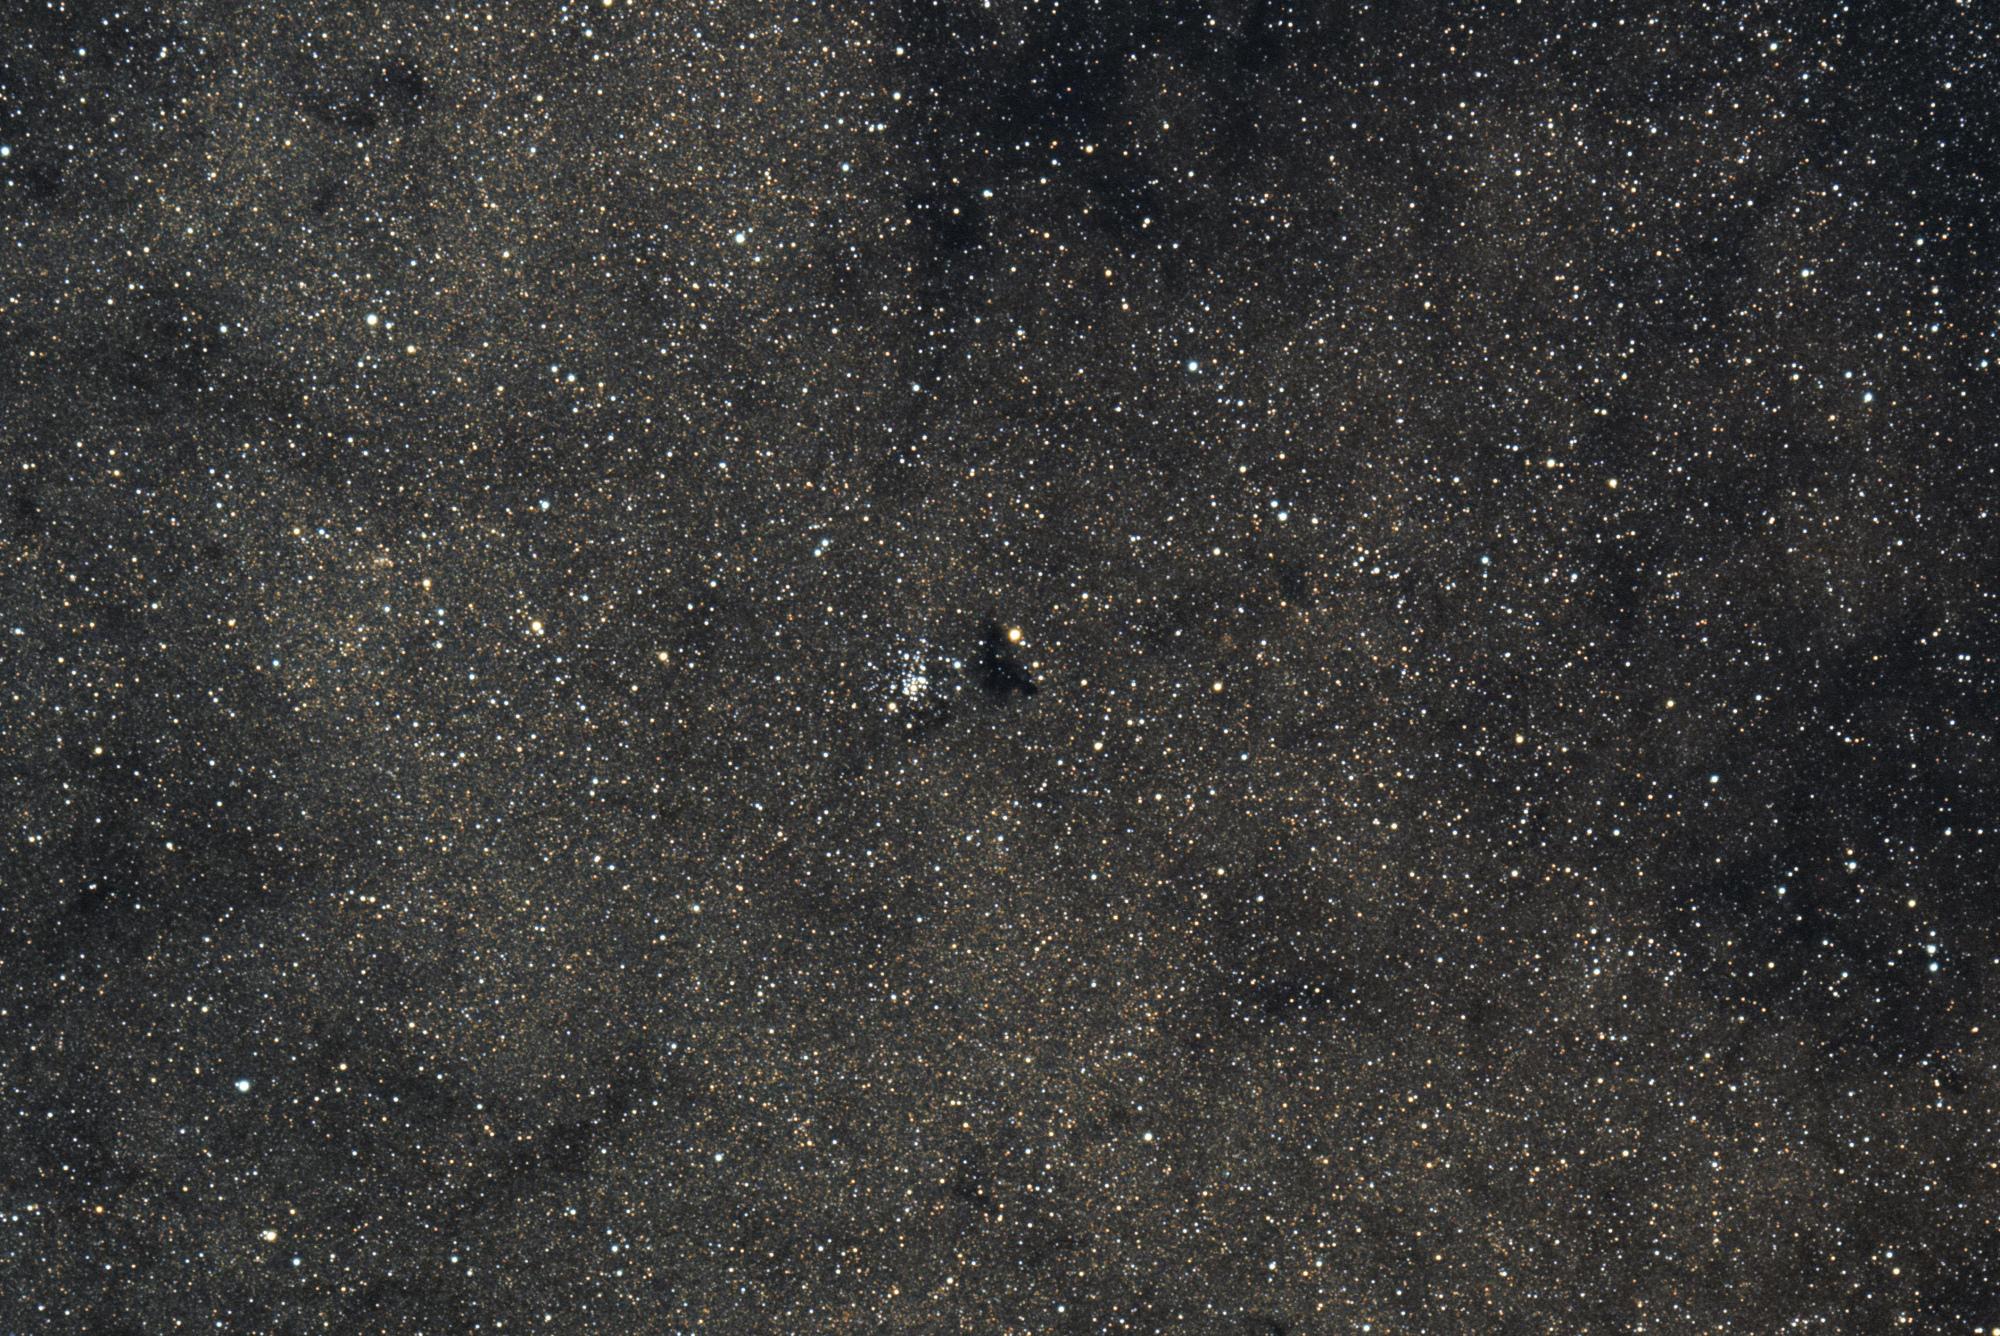 astro_Ink.jpg.42ced51d2e24847c95283c5e729b63a2.jpg